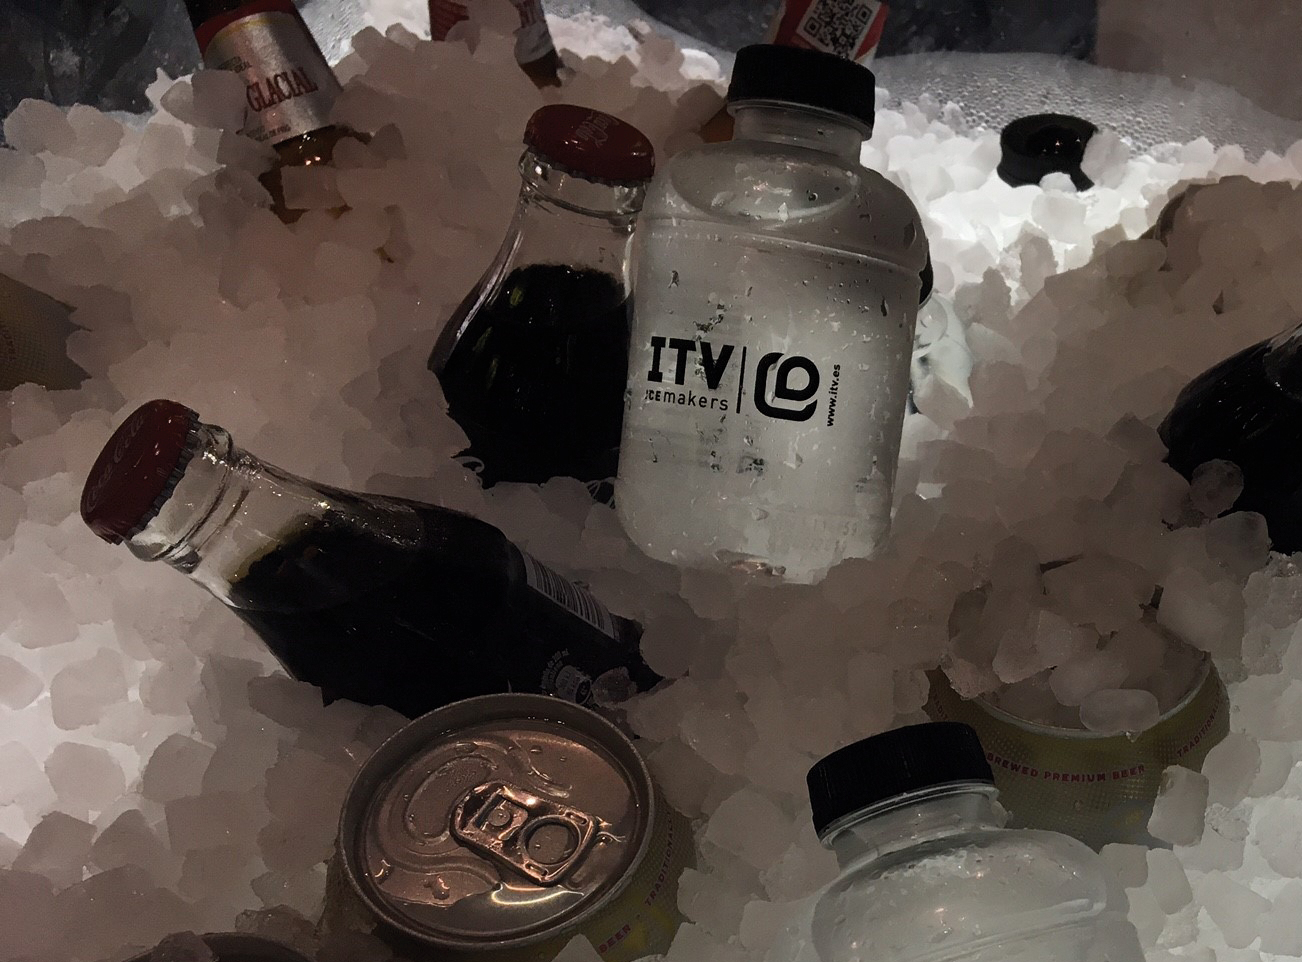 Botellas personalizadas ITEV icemakers